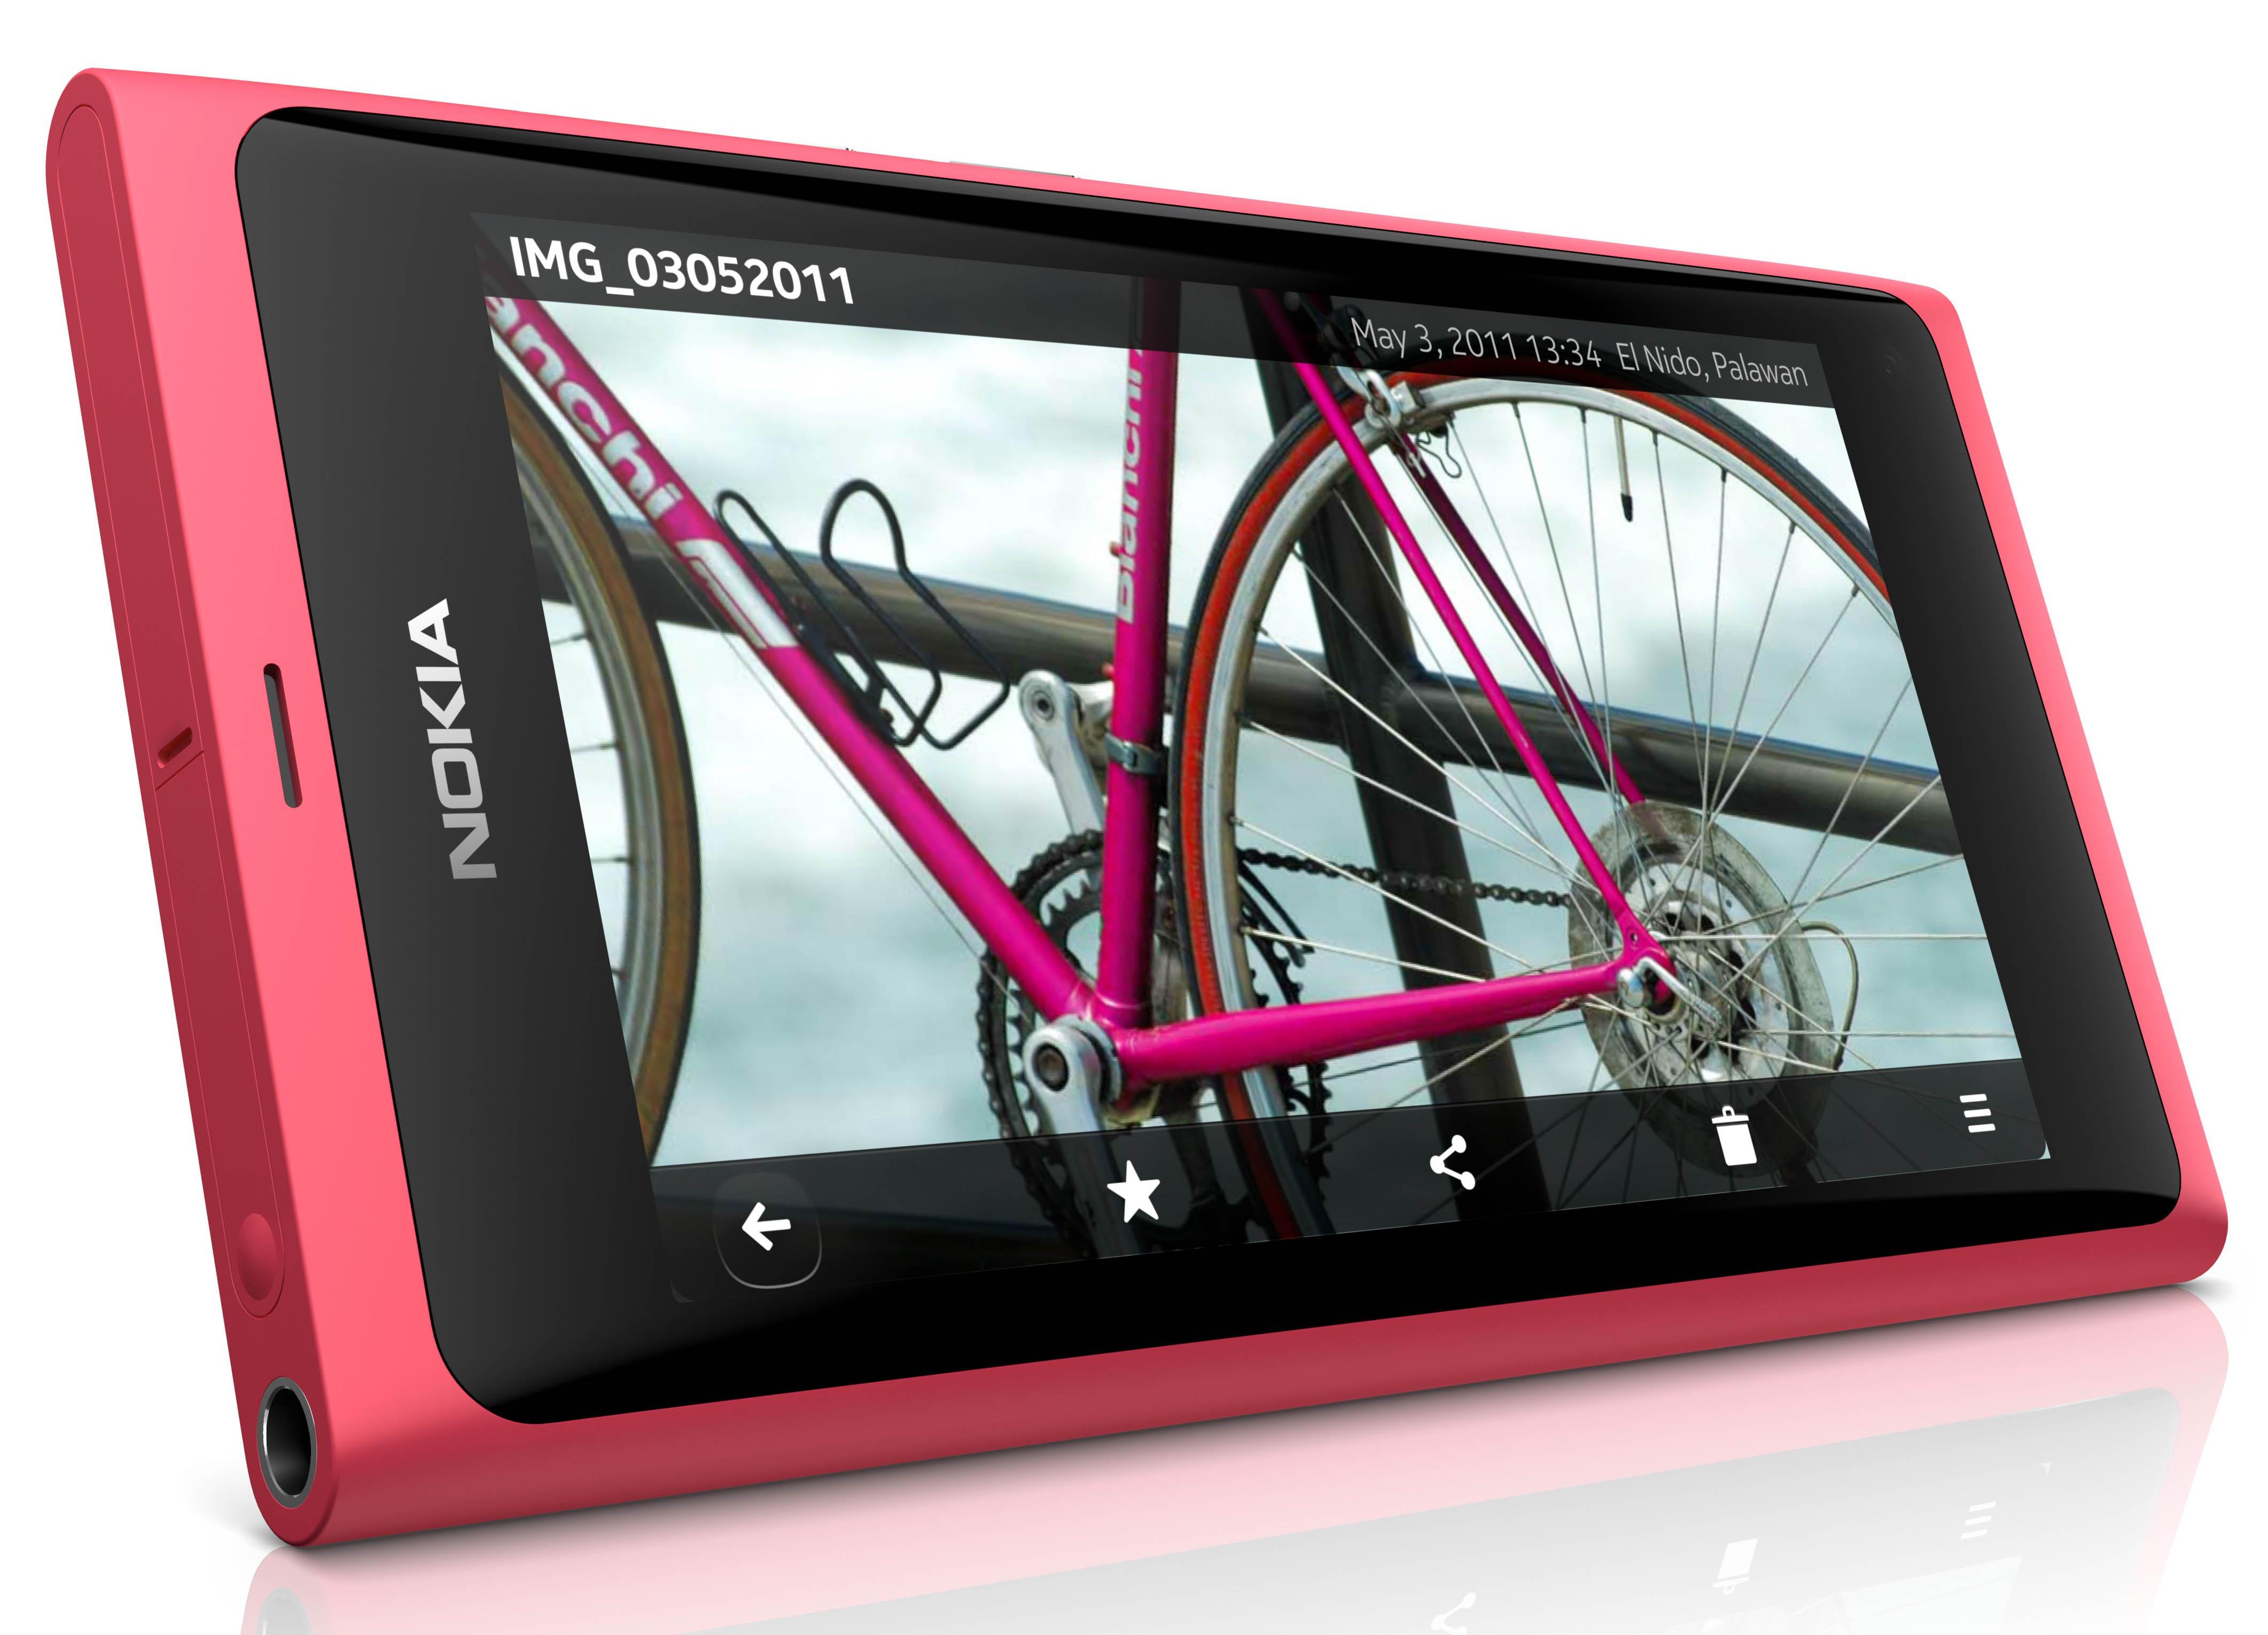 Nokia N9 Press Shot 3